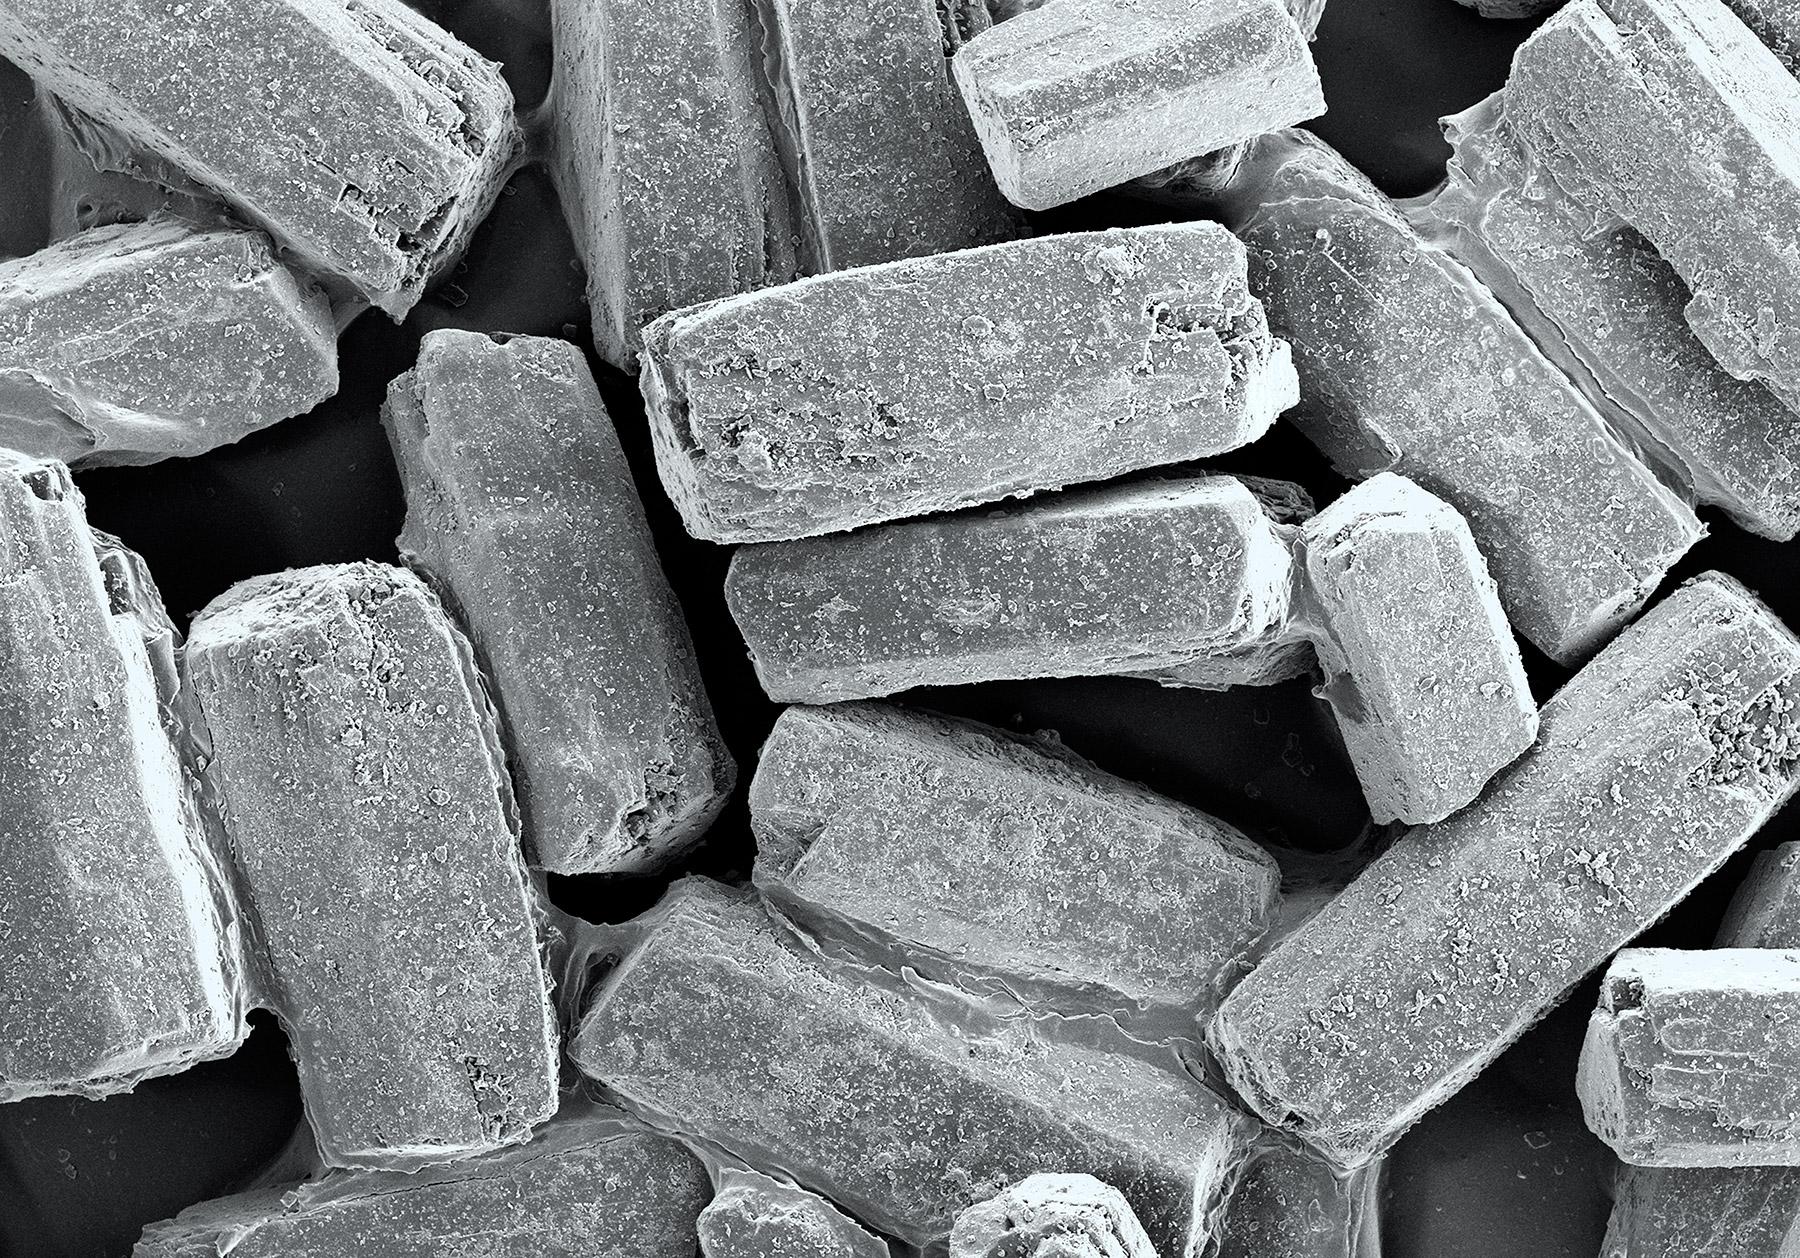 terra cibus no.18: sugar in the raw  15x magnification